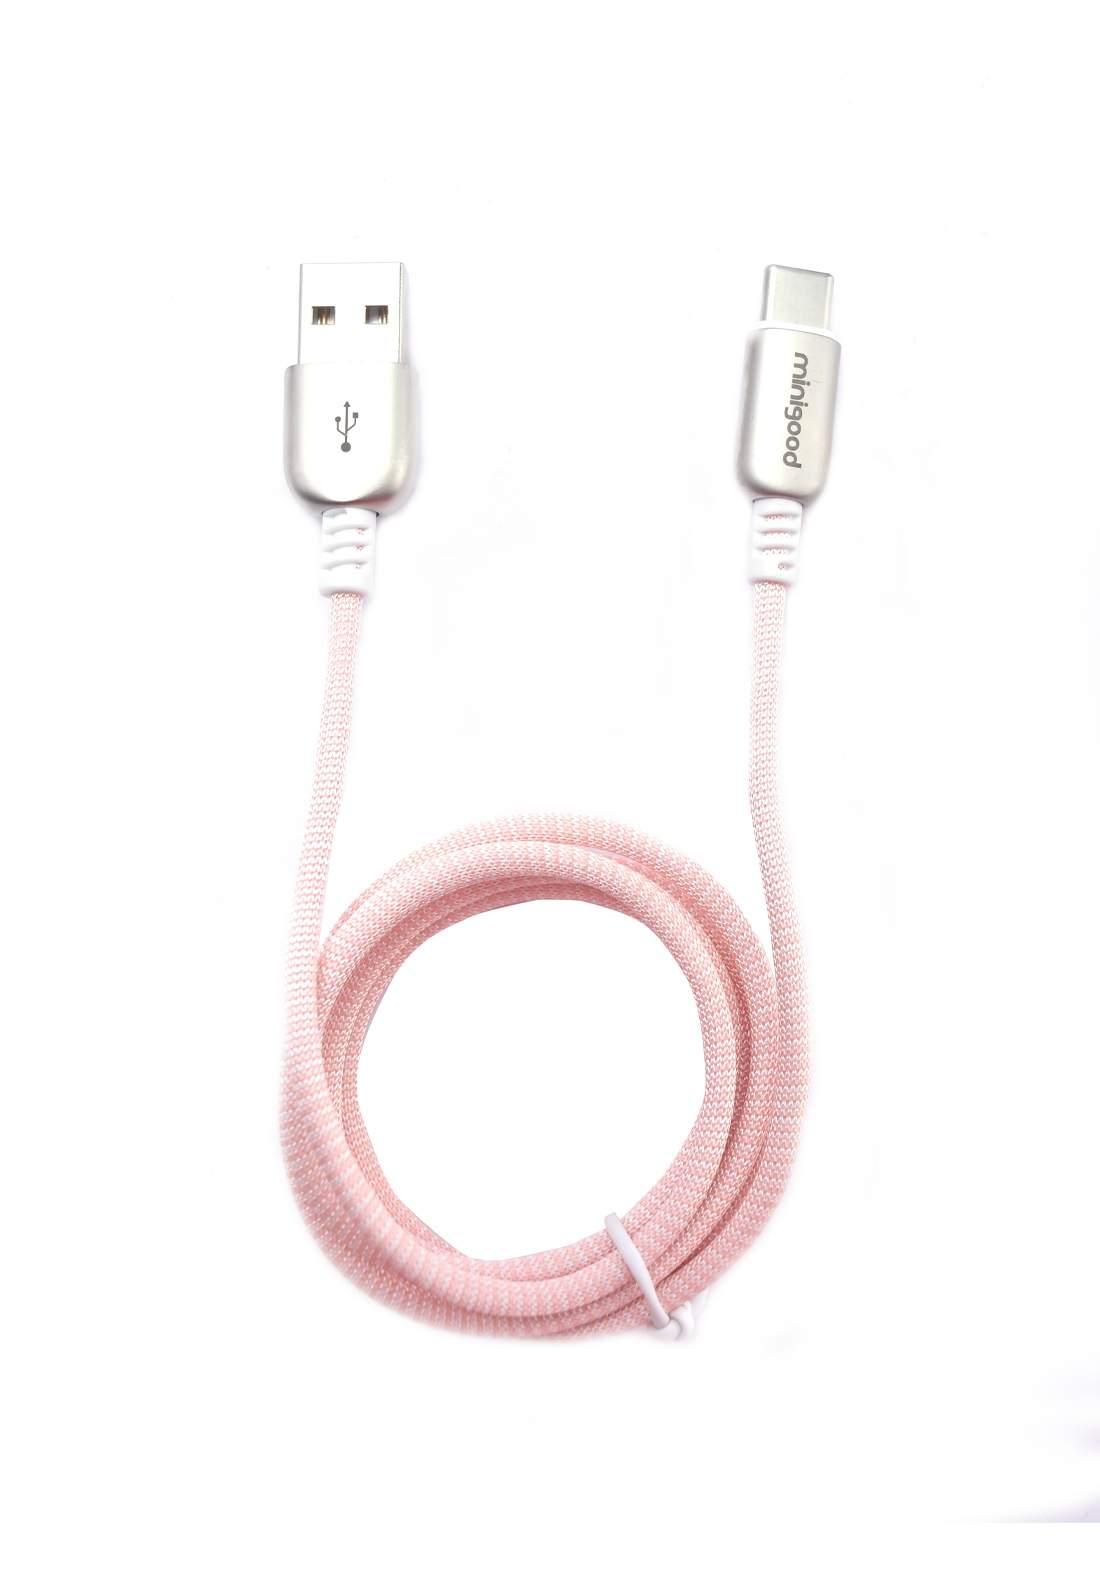 Minigood USB to Type C Data Cable 1m  - Pink كابل